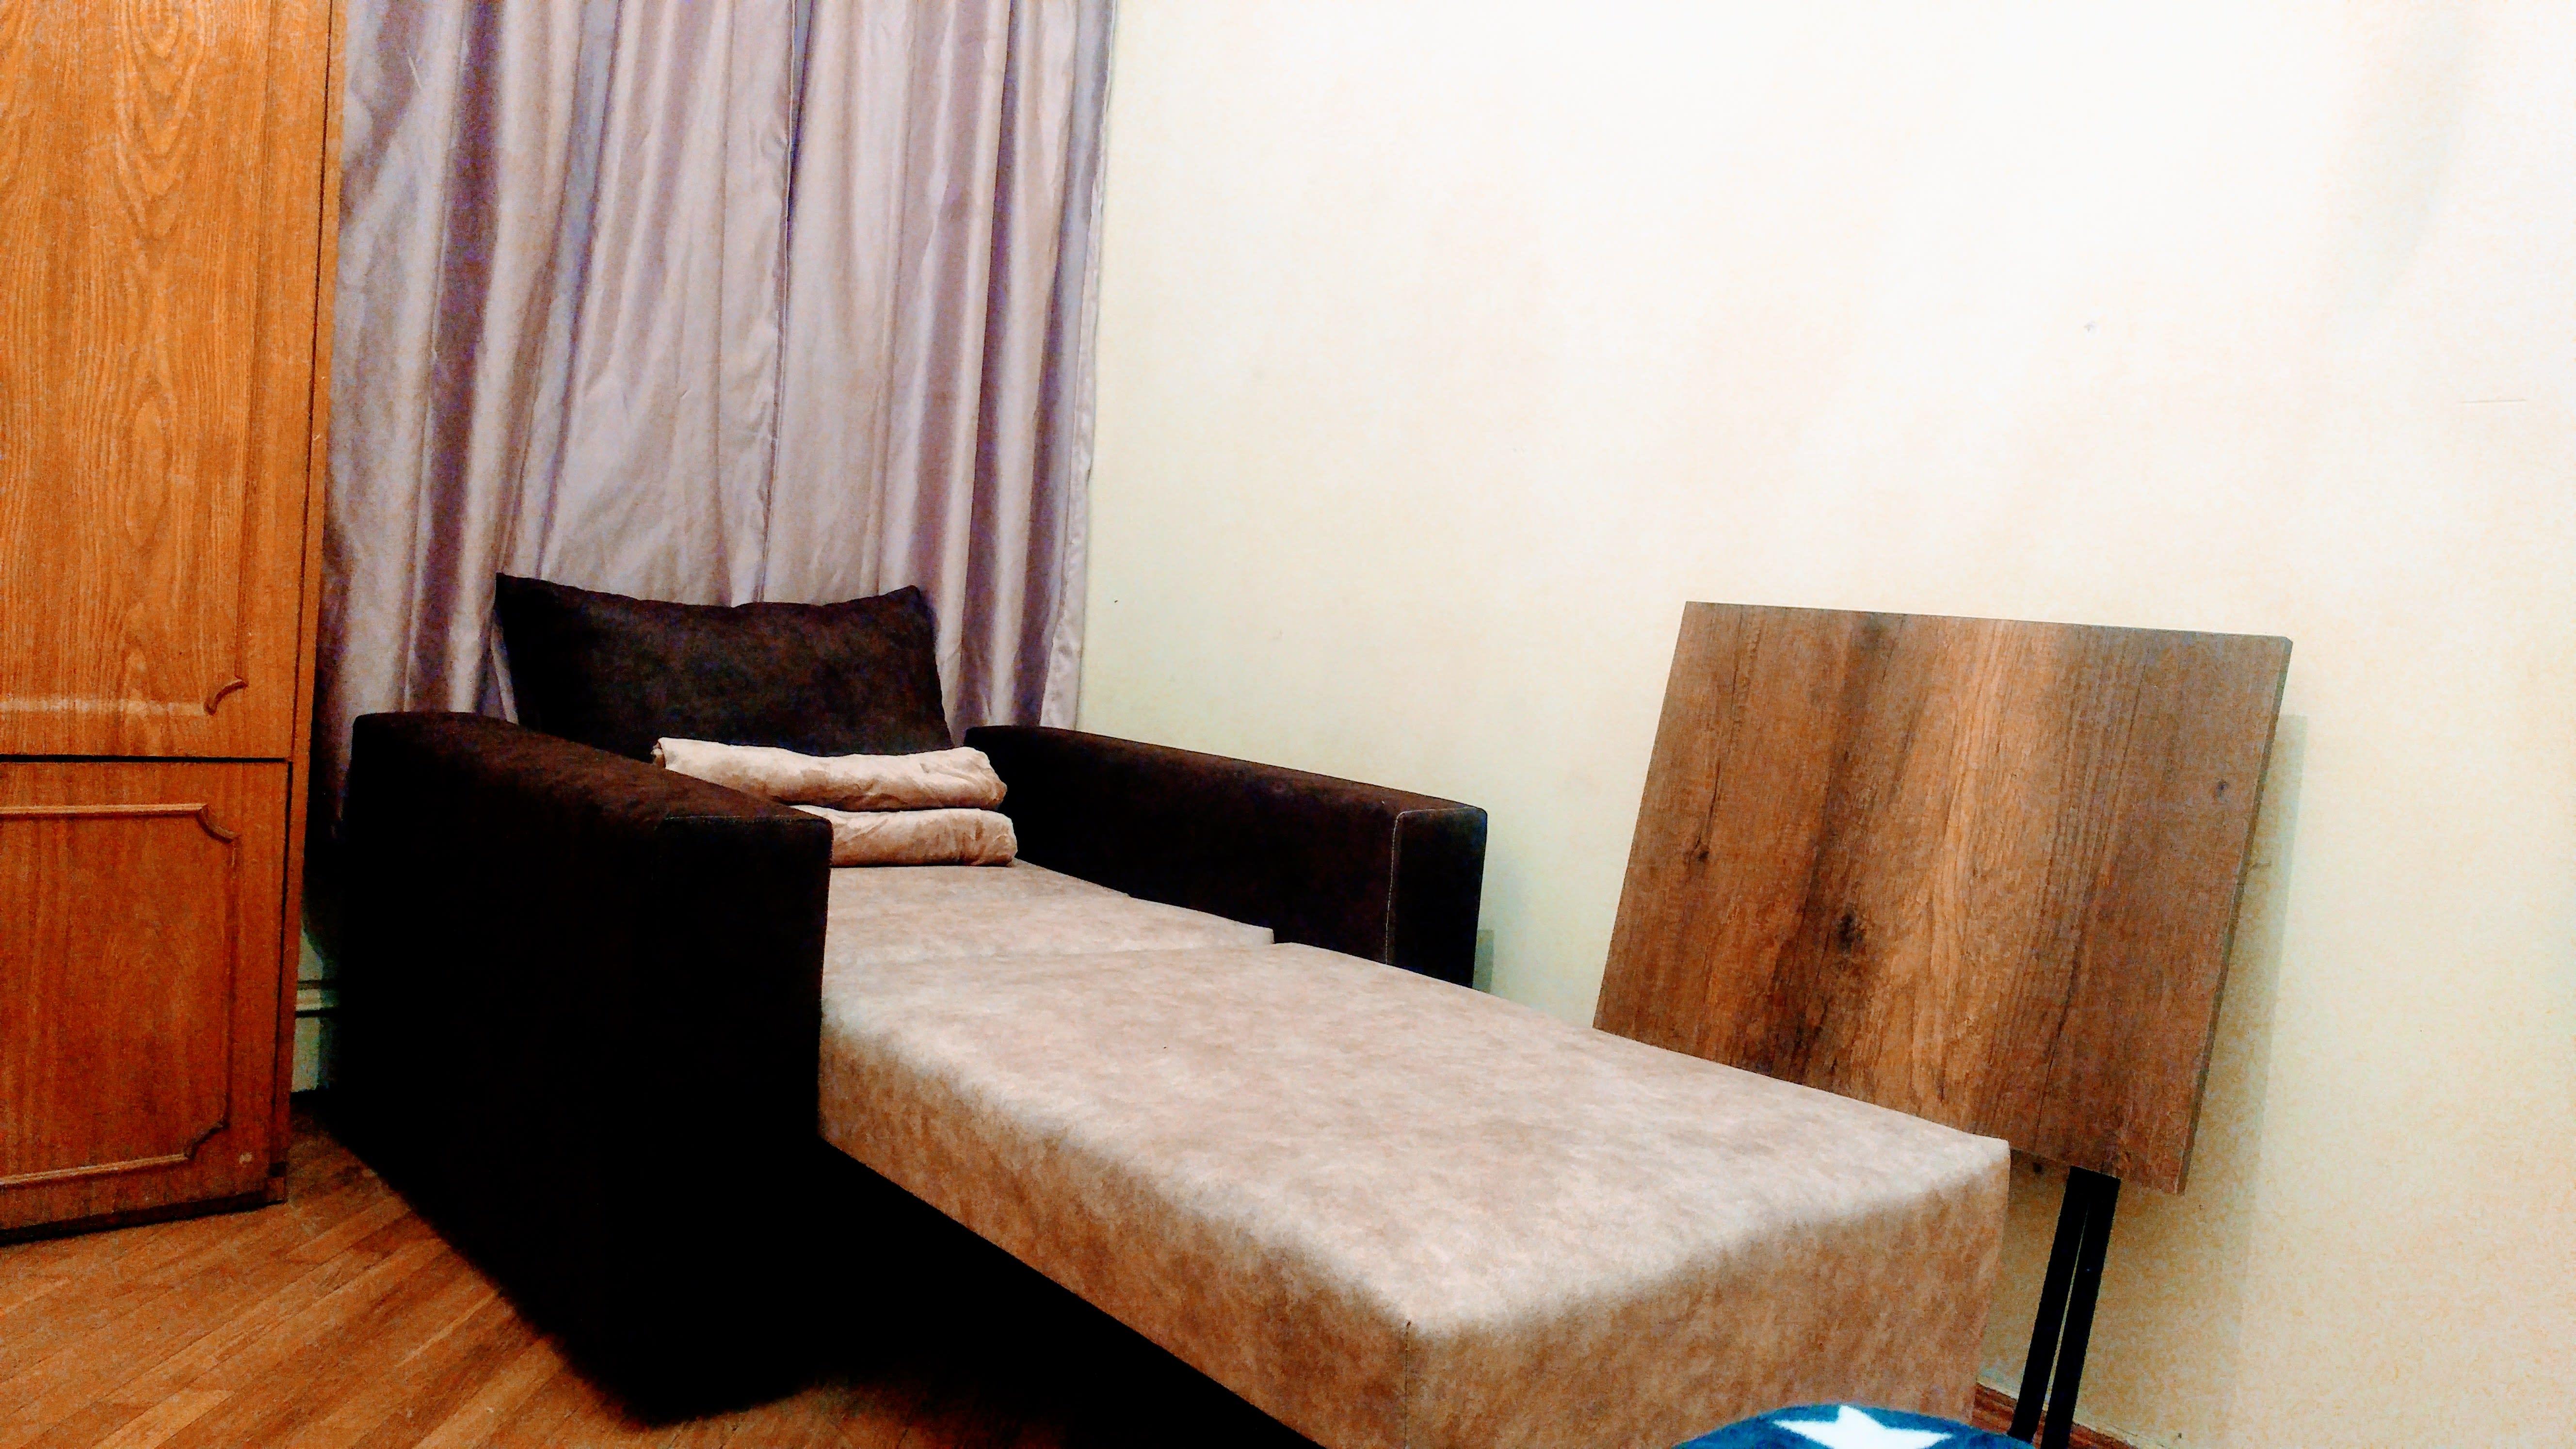 HOSTEL - TBT Hostel